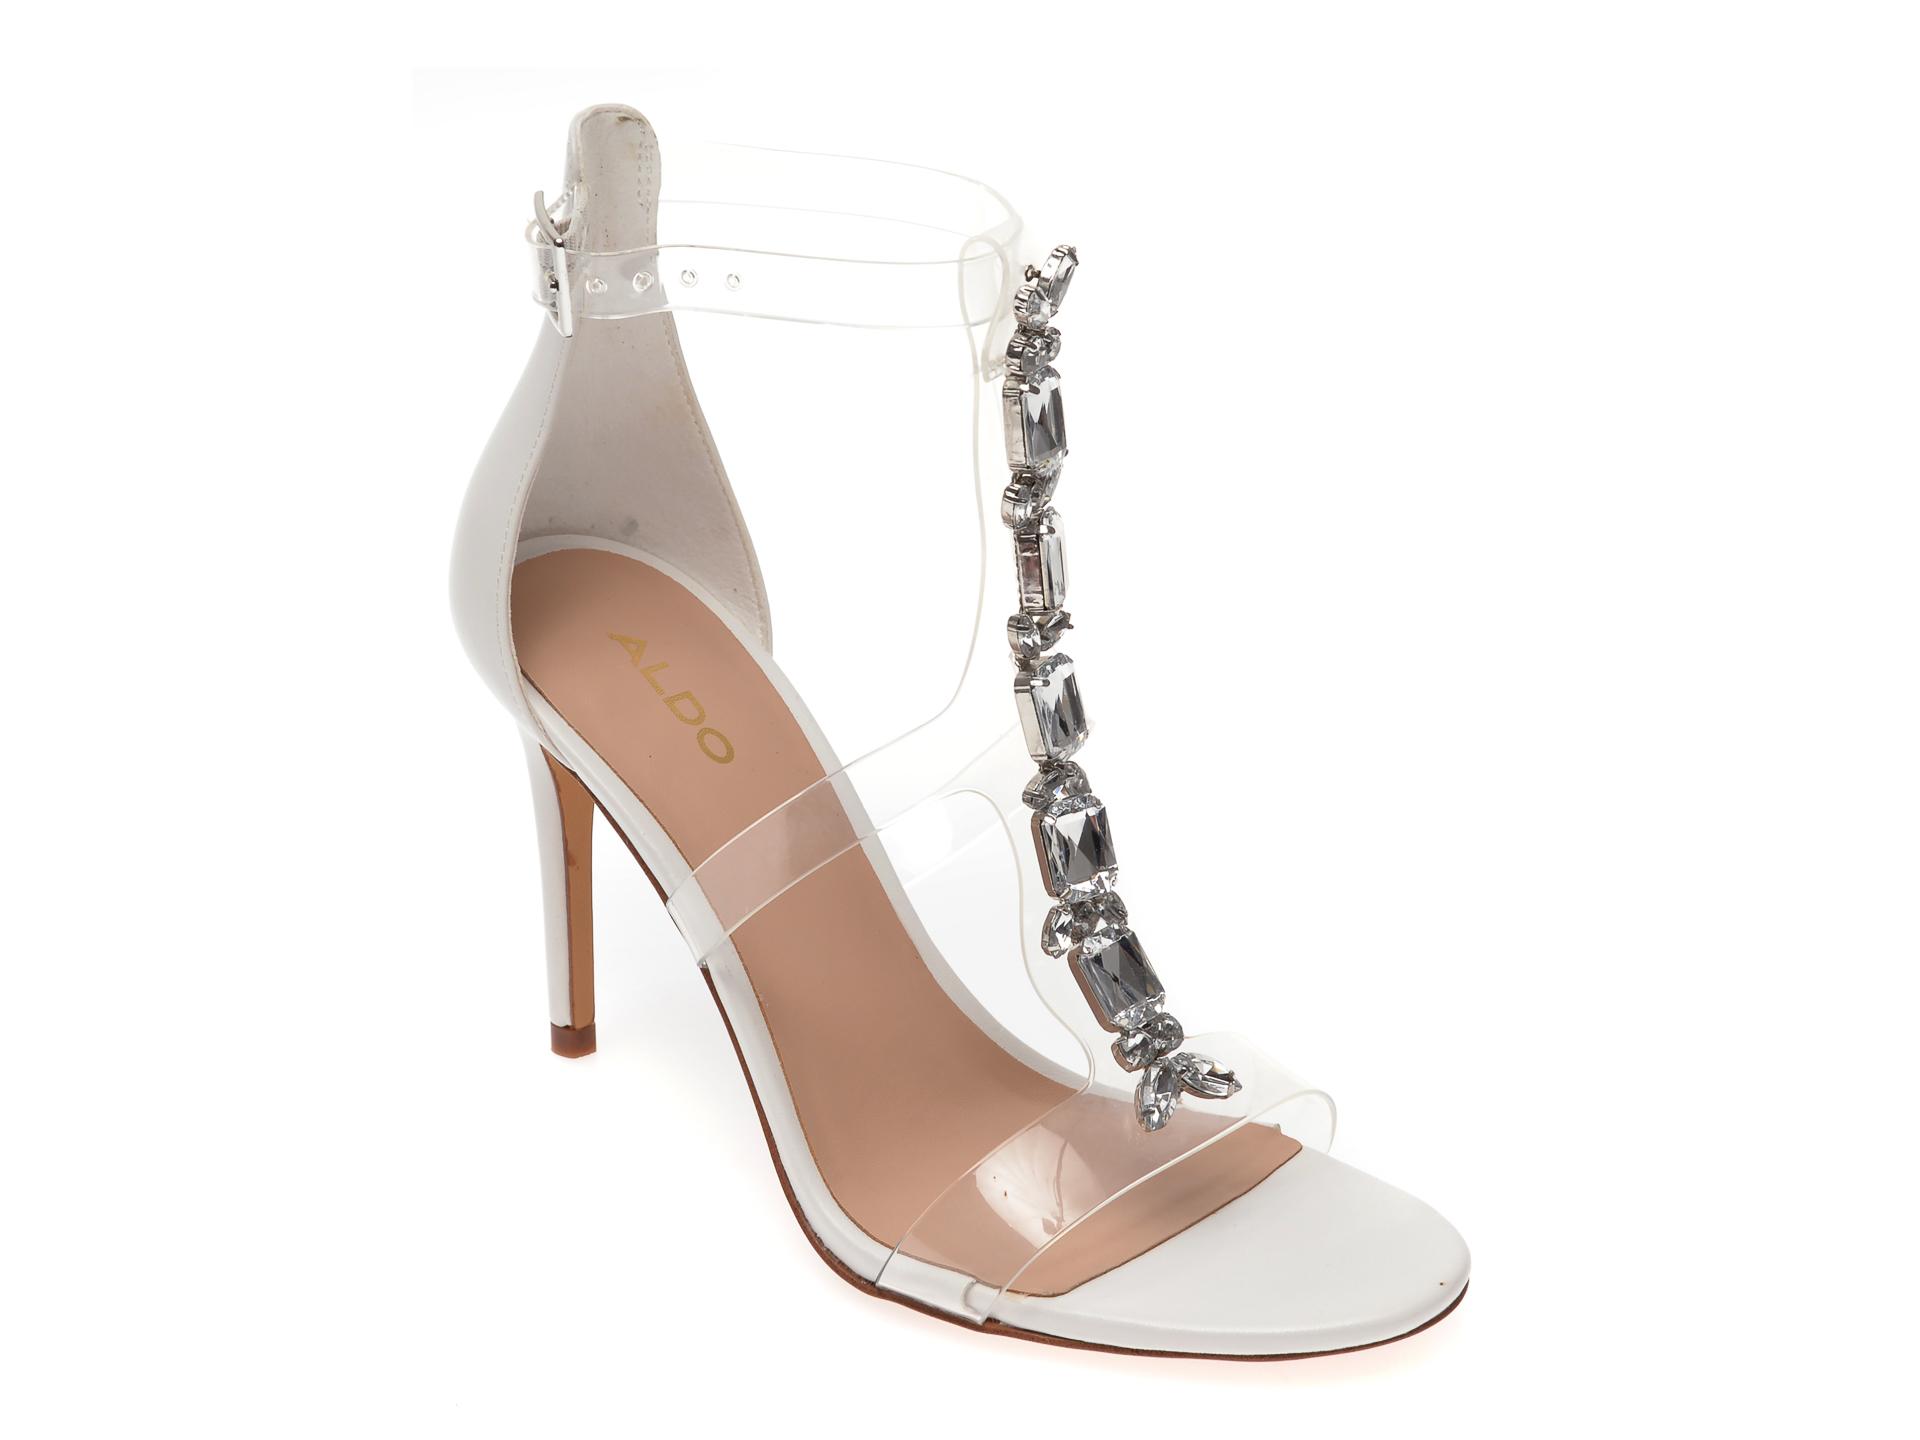 Sandale ALDO albe, Weberlaan100, din piele ecologica